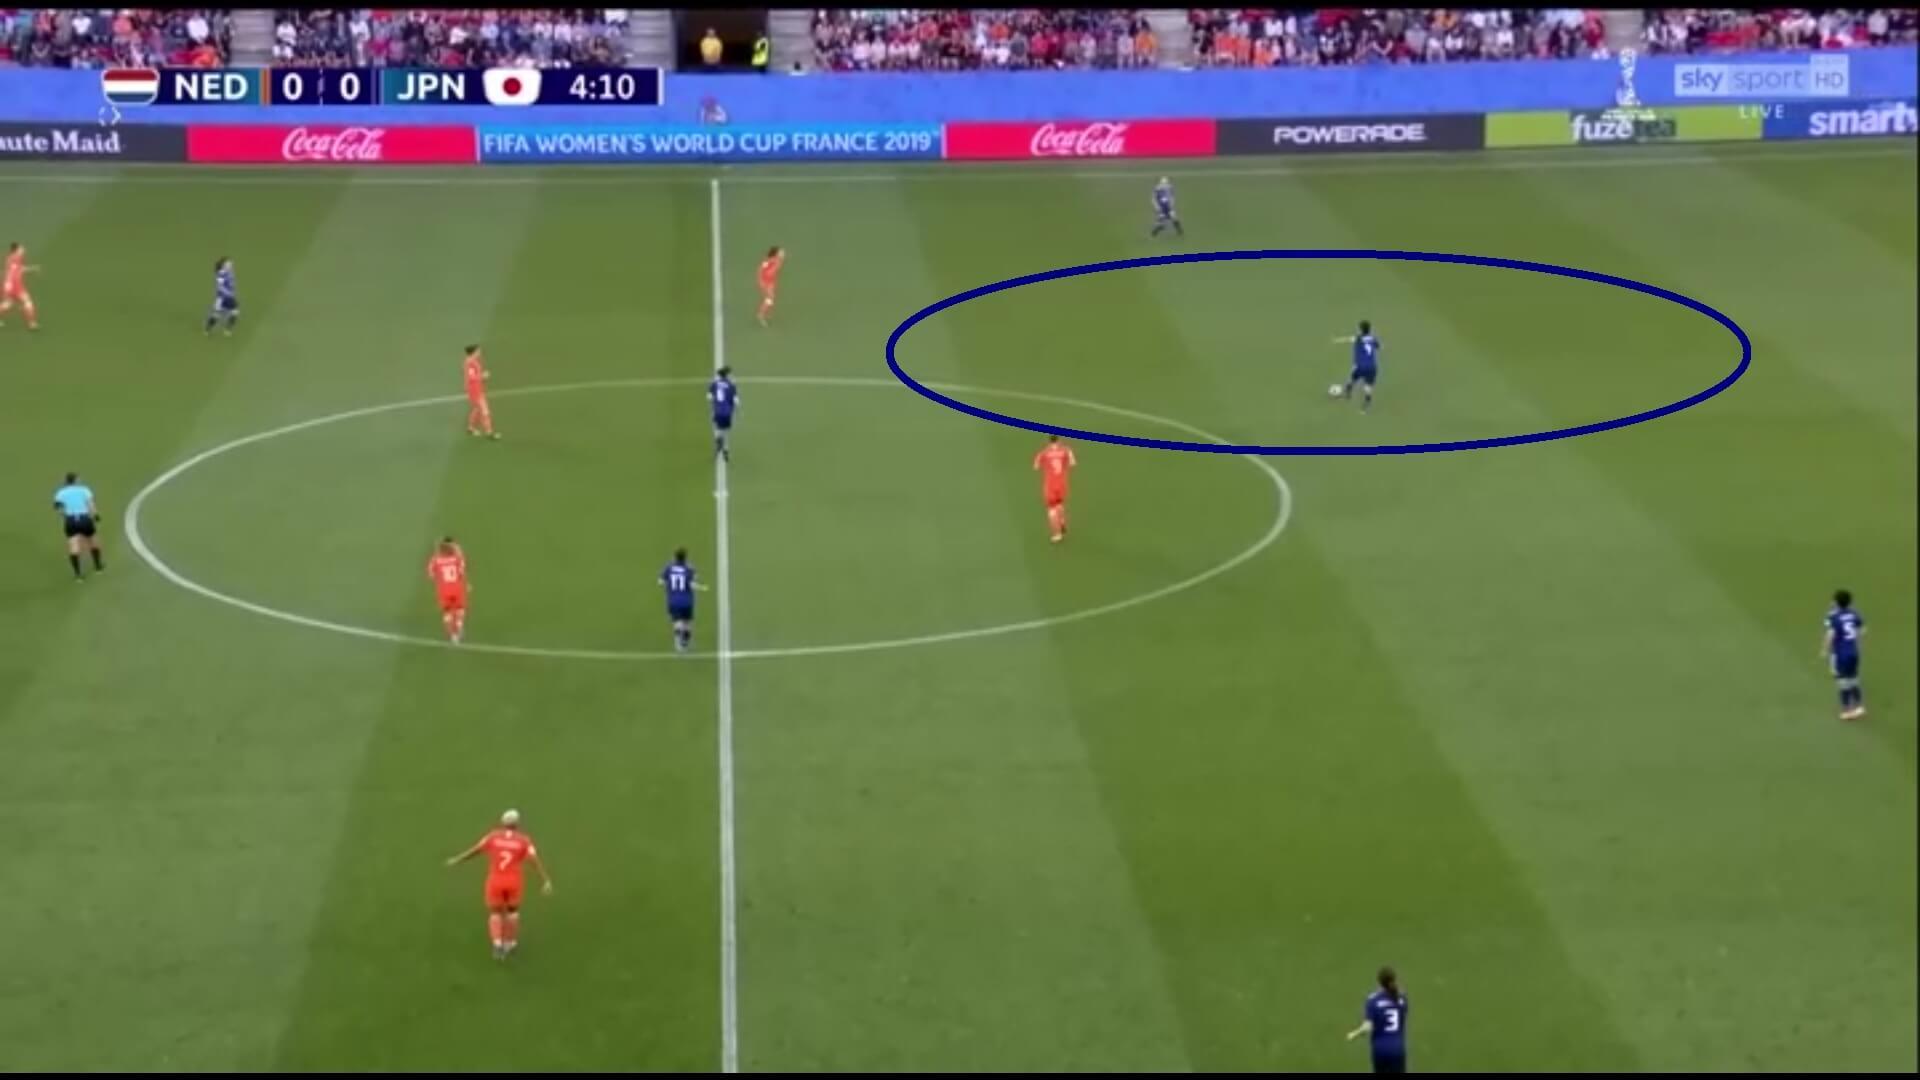 FIFA Women's World Cup 2019 Tactical Analysis: Netherlands vs Japan